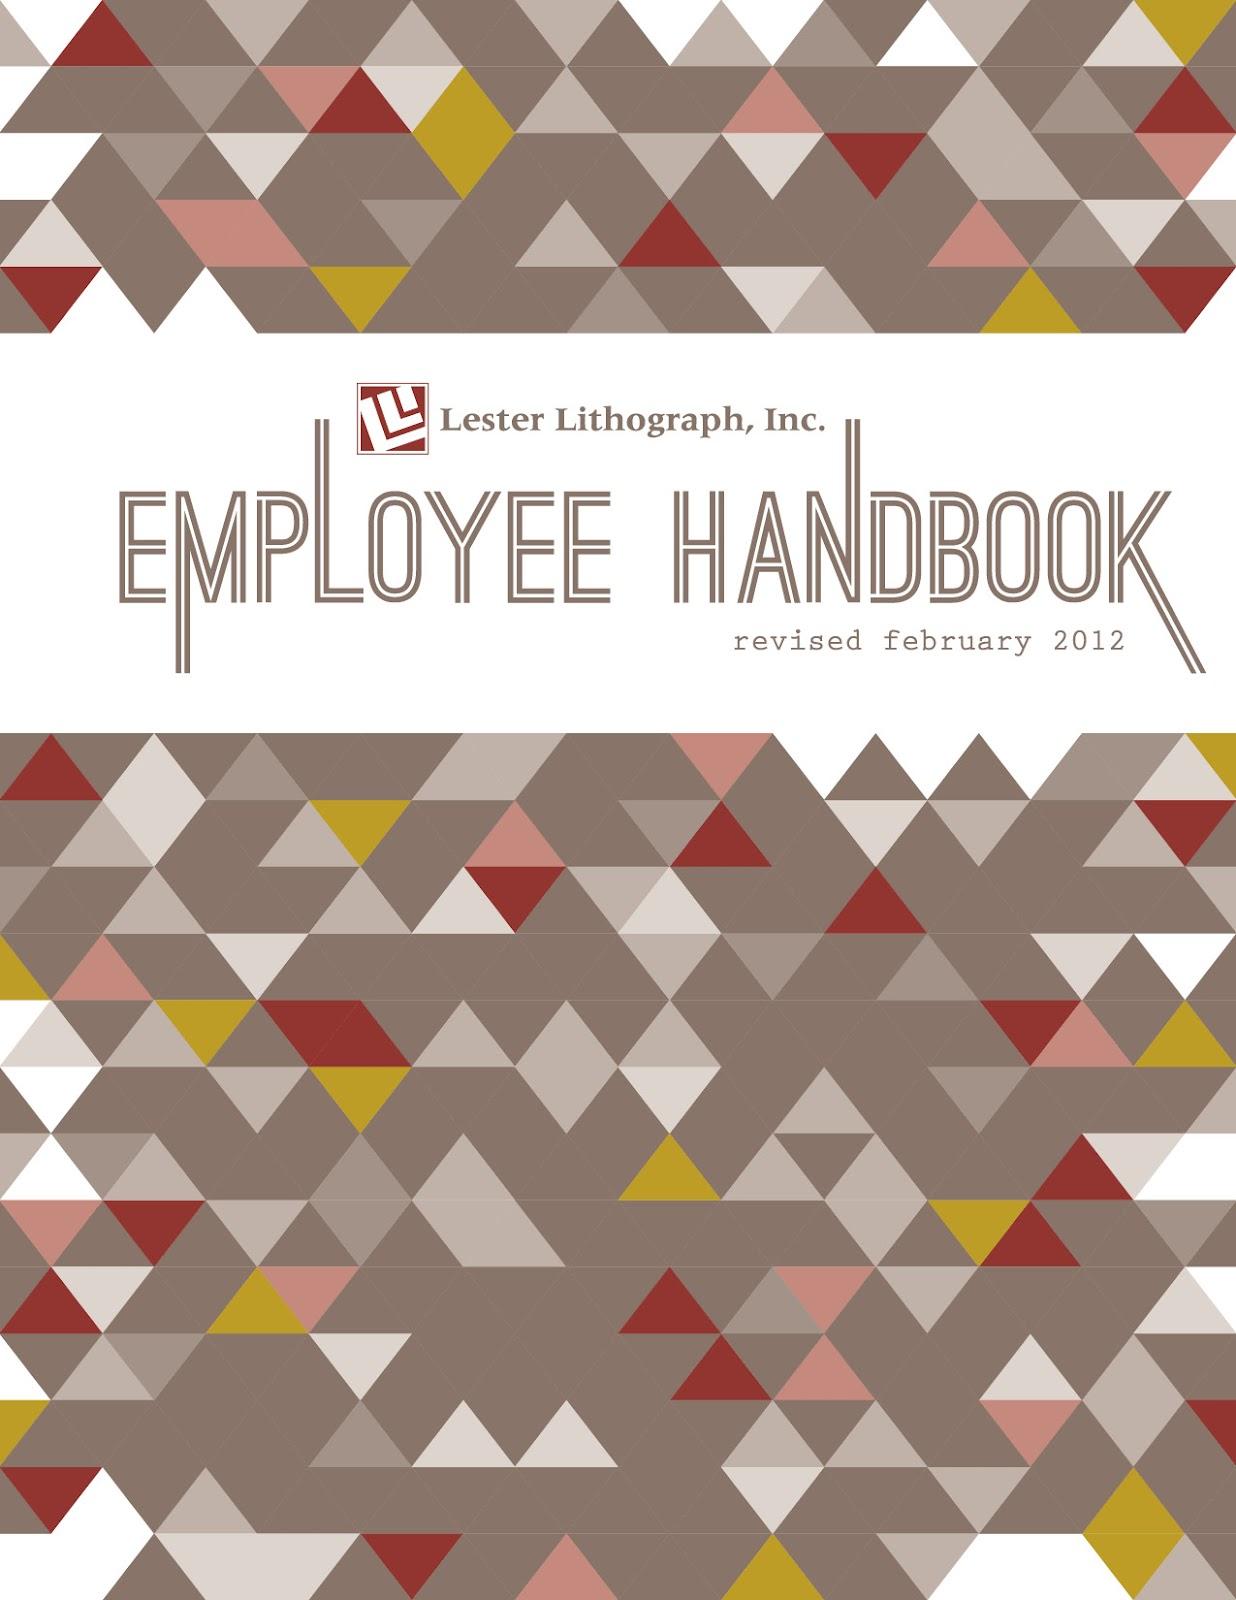 employee handbook cover design template heather l myers graphic design employee handbook cover